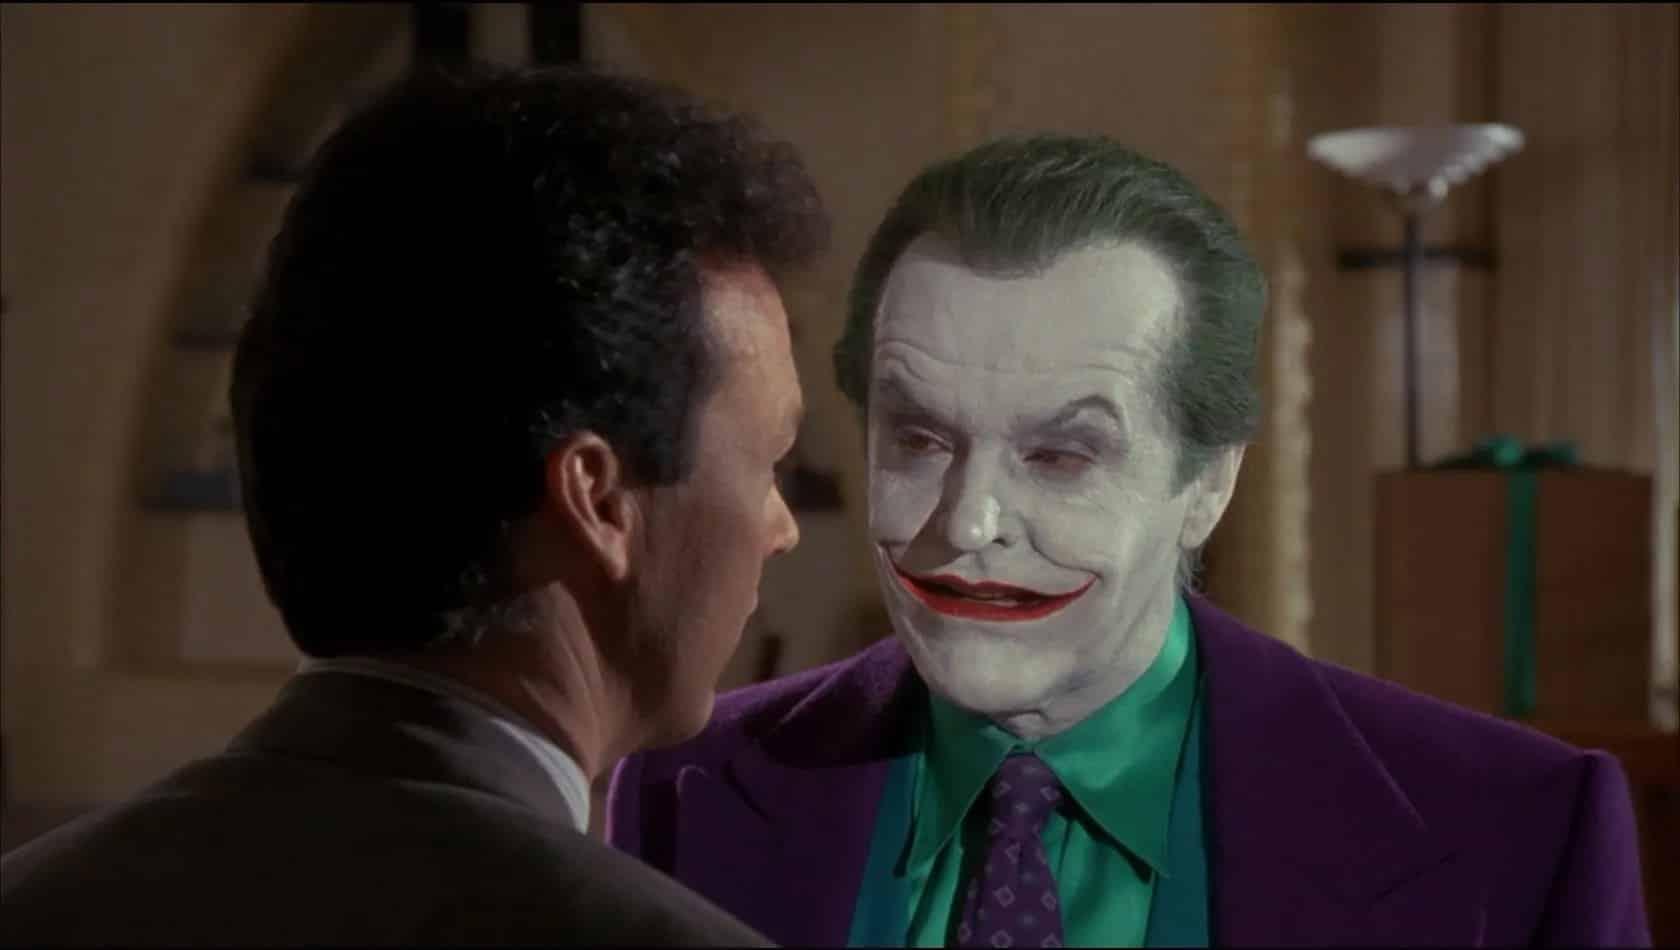 Michael Keaton Batman Returns Tim Burton unique Batman take of Bruce Wayne man child Jack Nicholson Joker